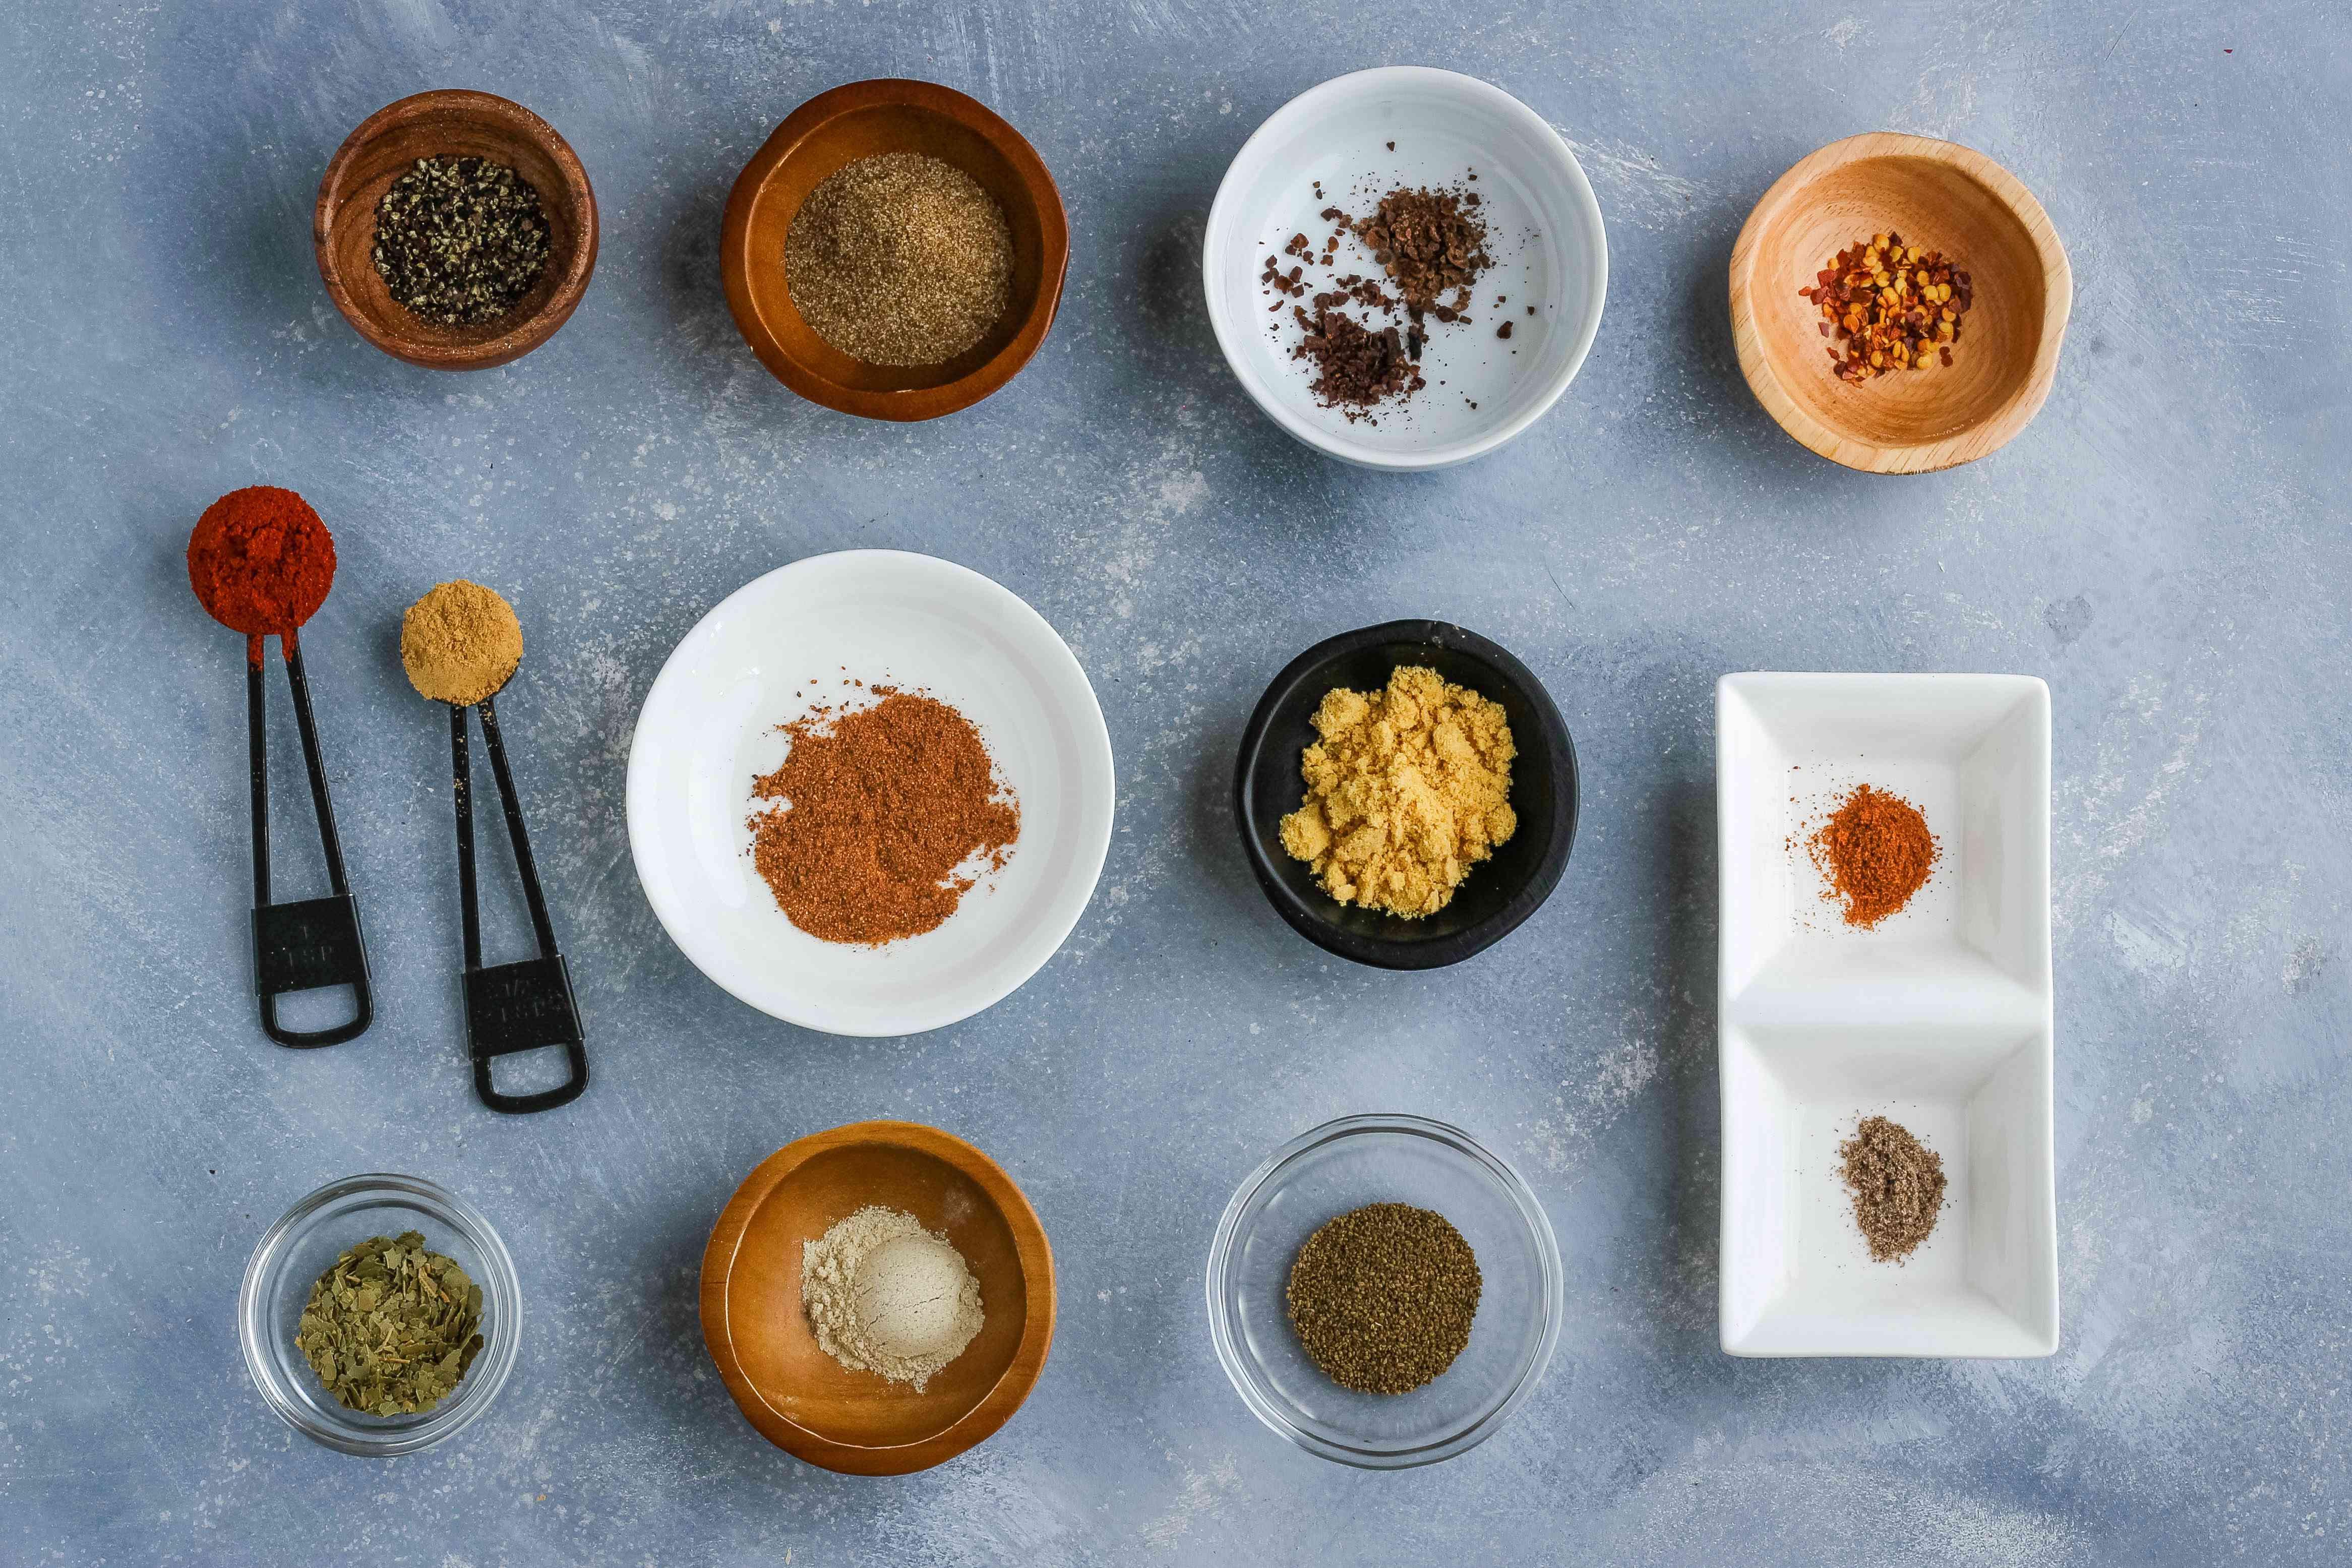 Ingredients for Old Bay-style seasoning